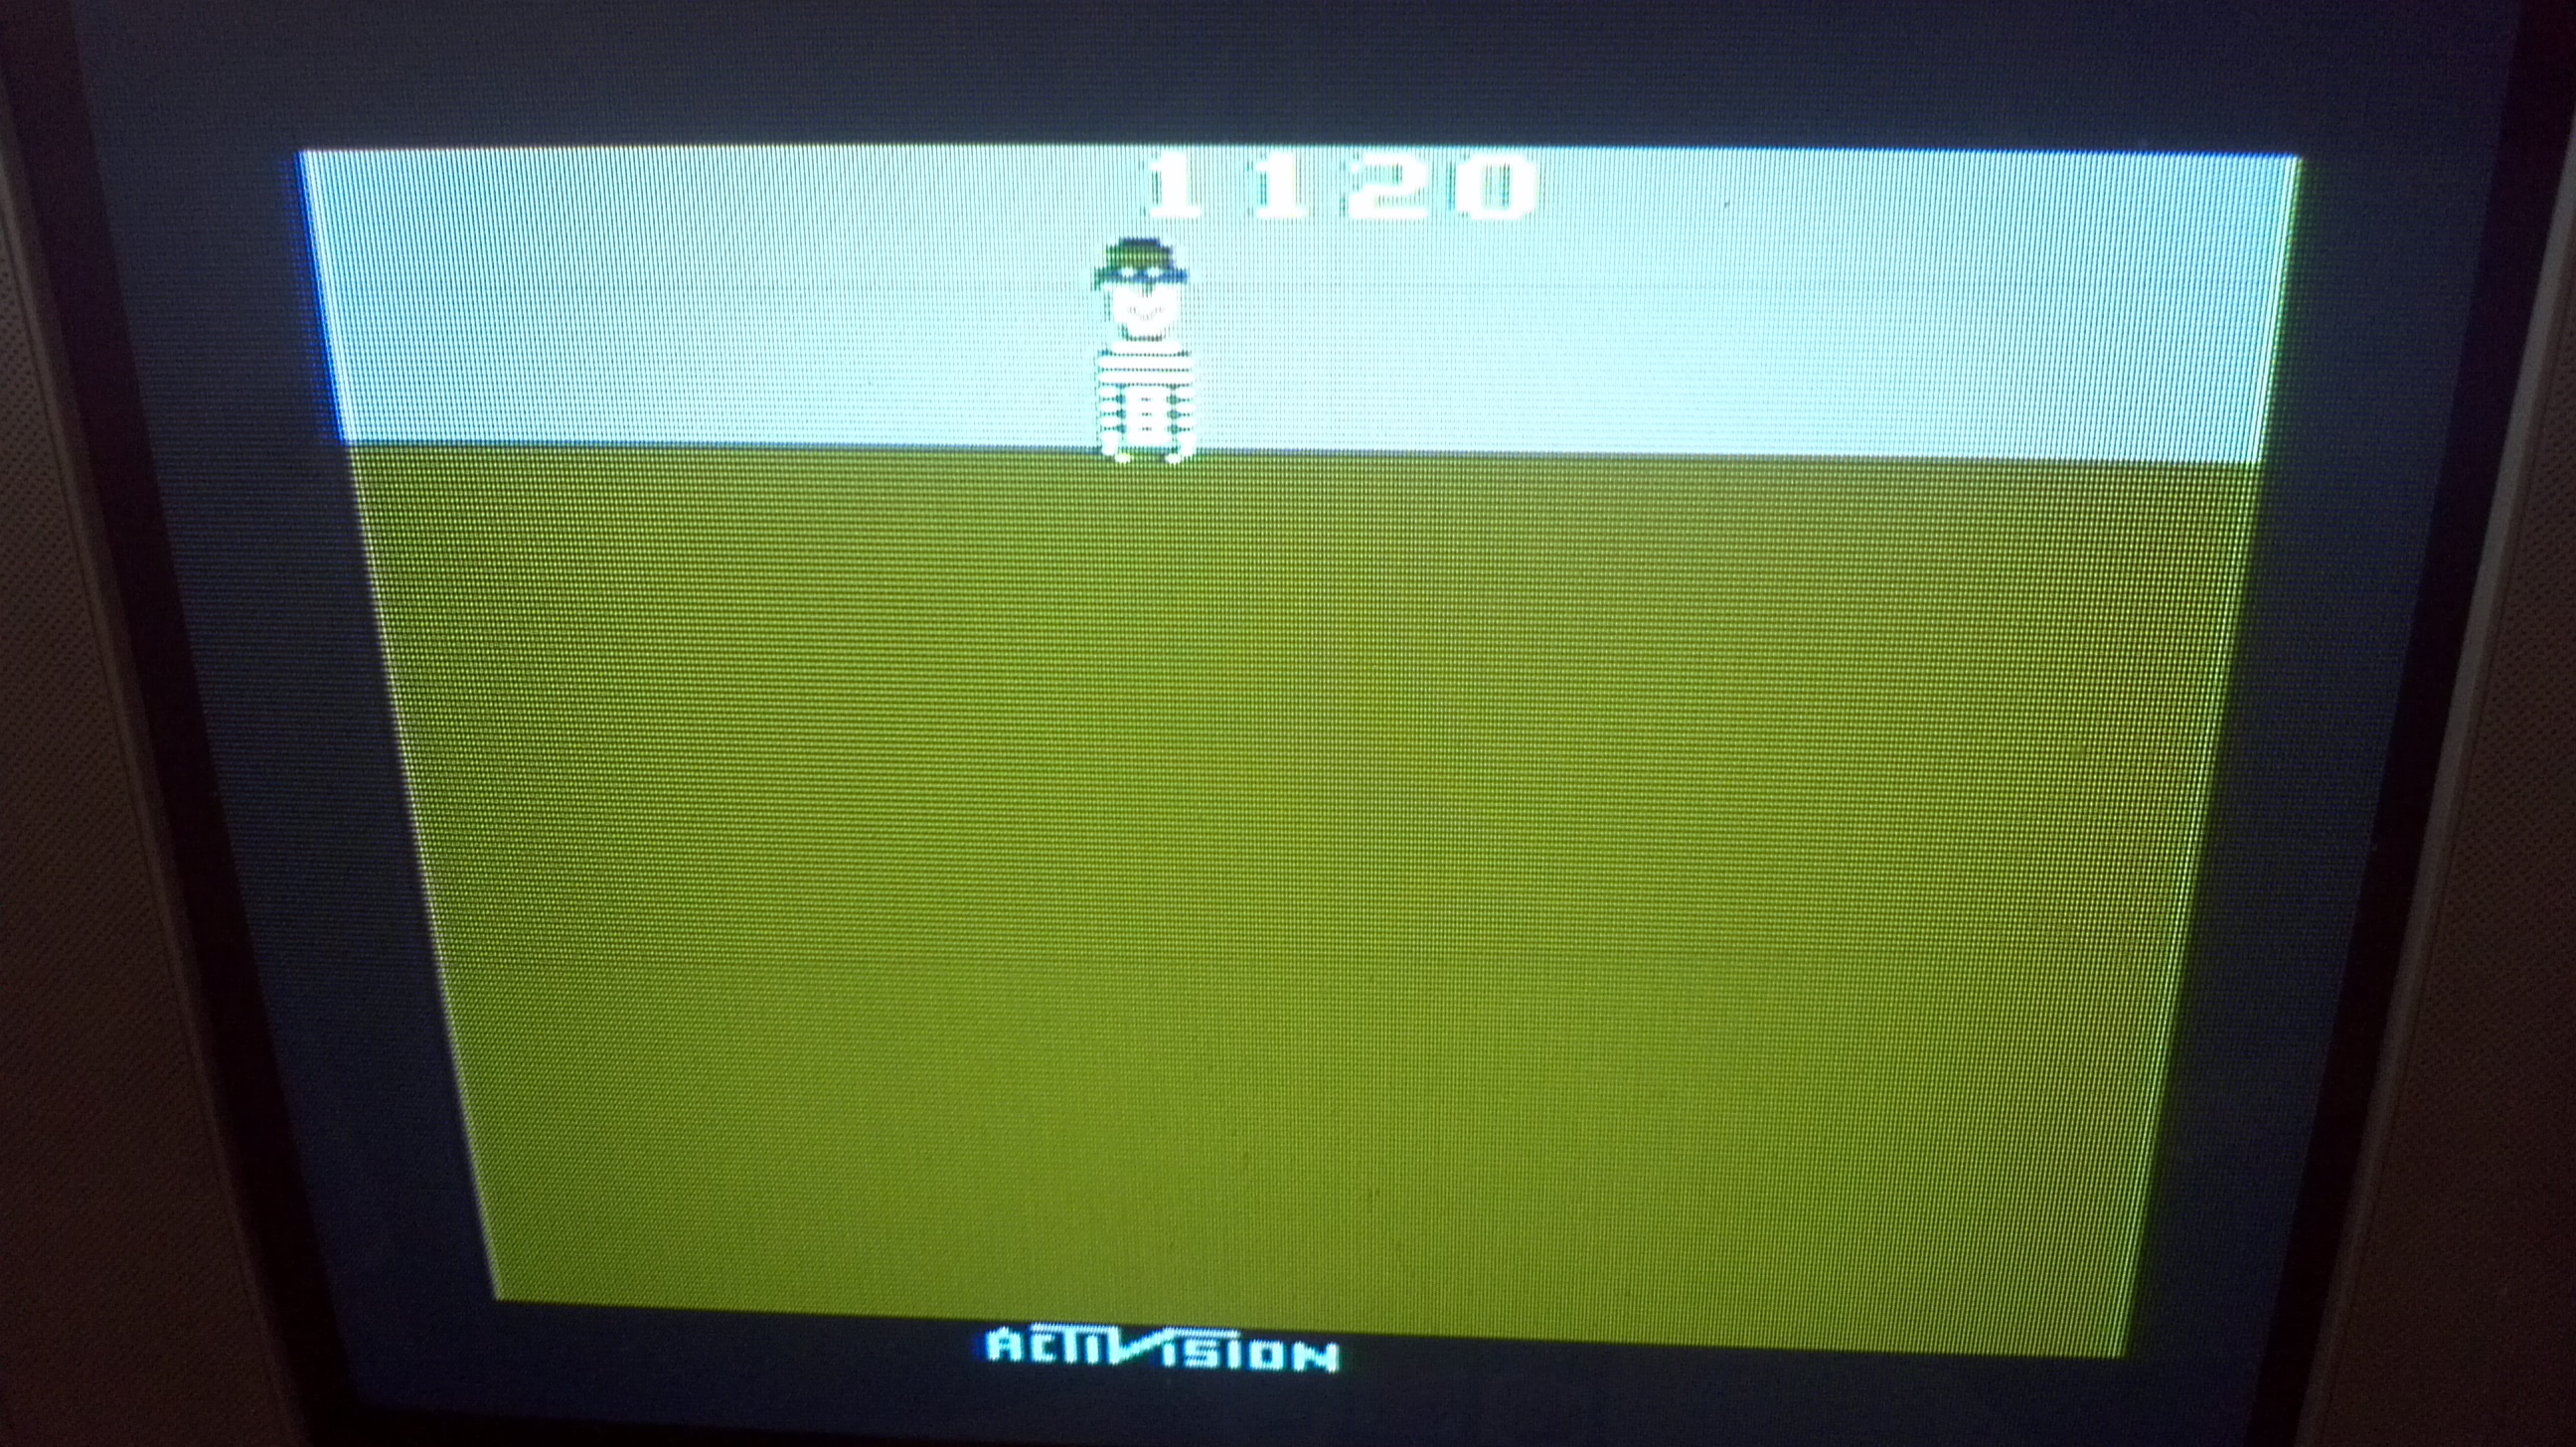 Liduario: Kaboom! (Atari 2600 Novice/B) 1,120 points on 2014-05-27 09:20:09